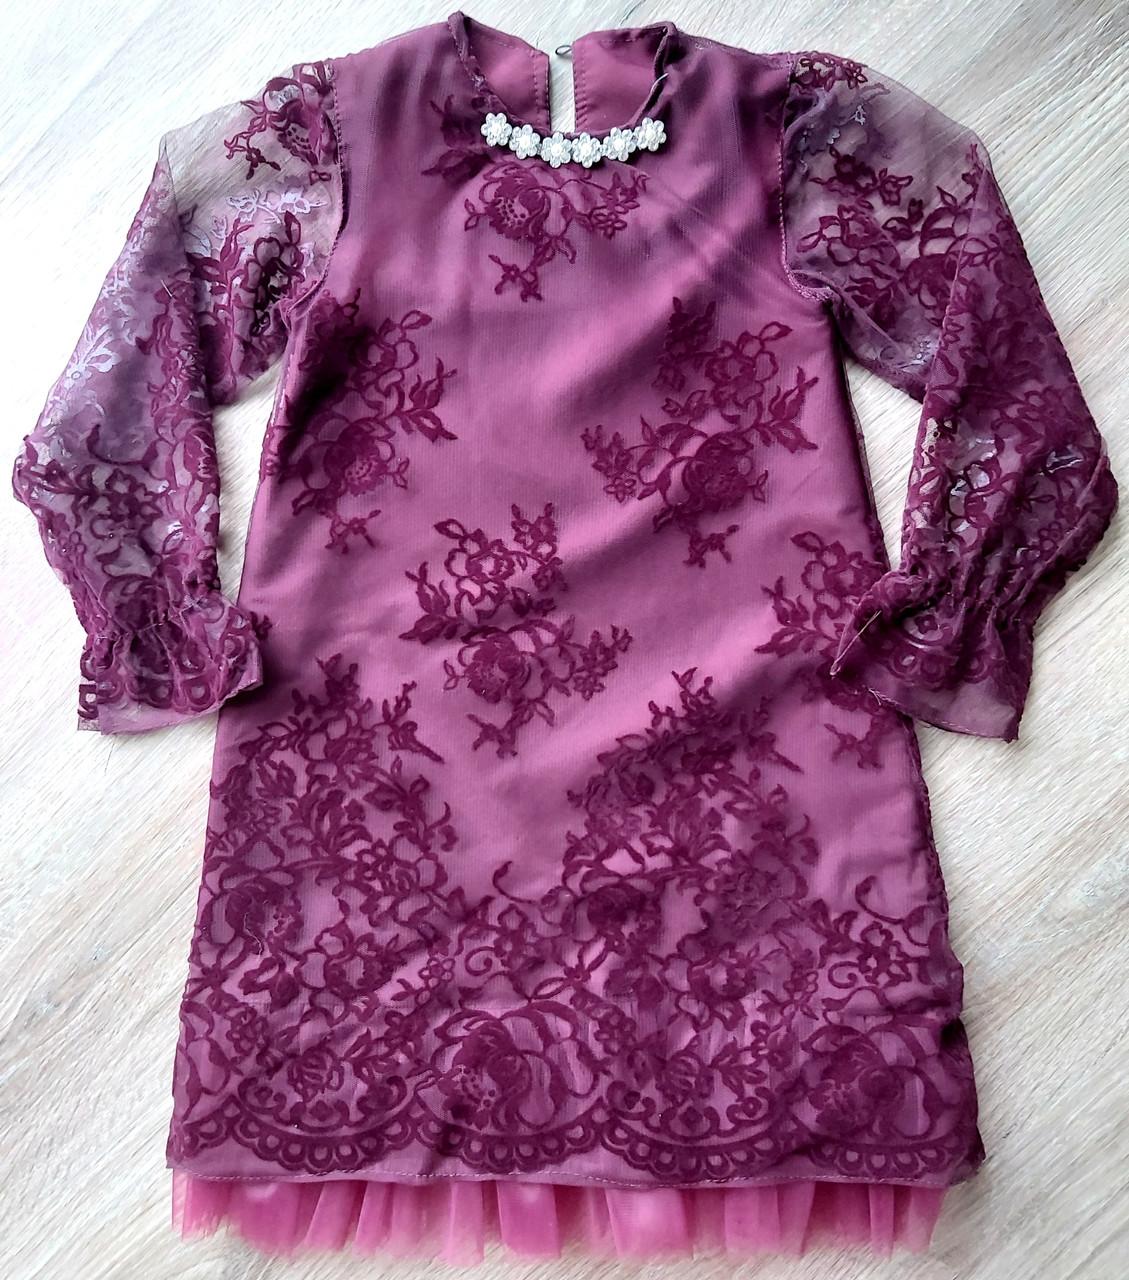 Дитяча елегантне плаття Ажур бордо